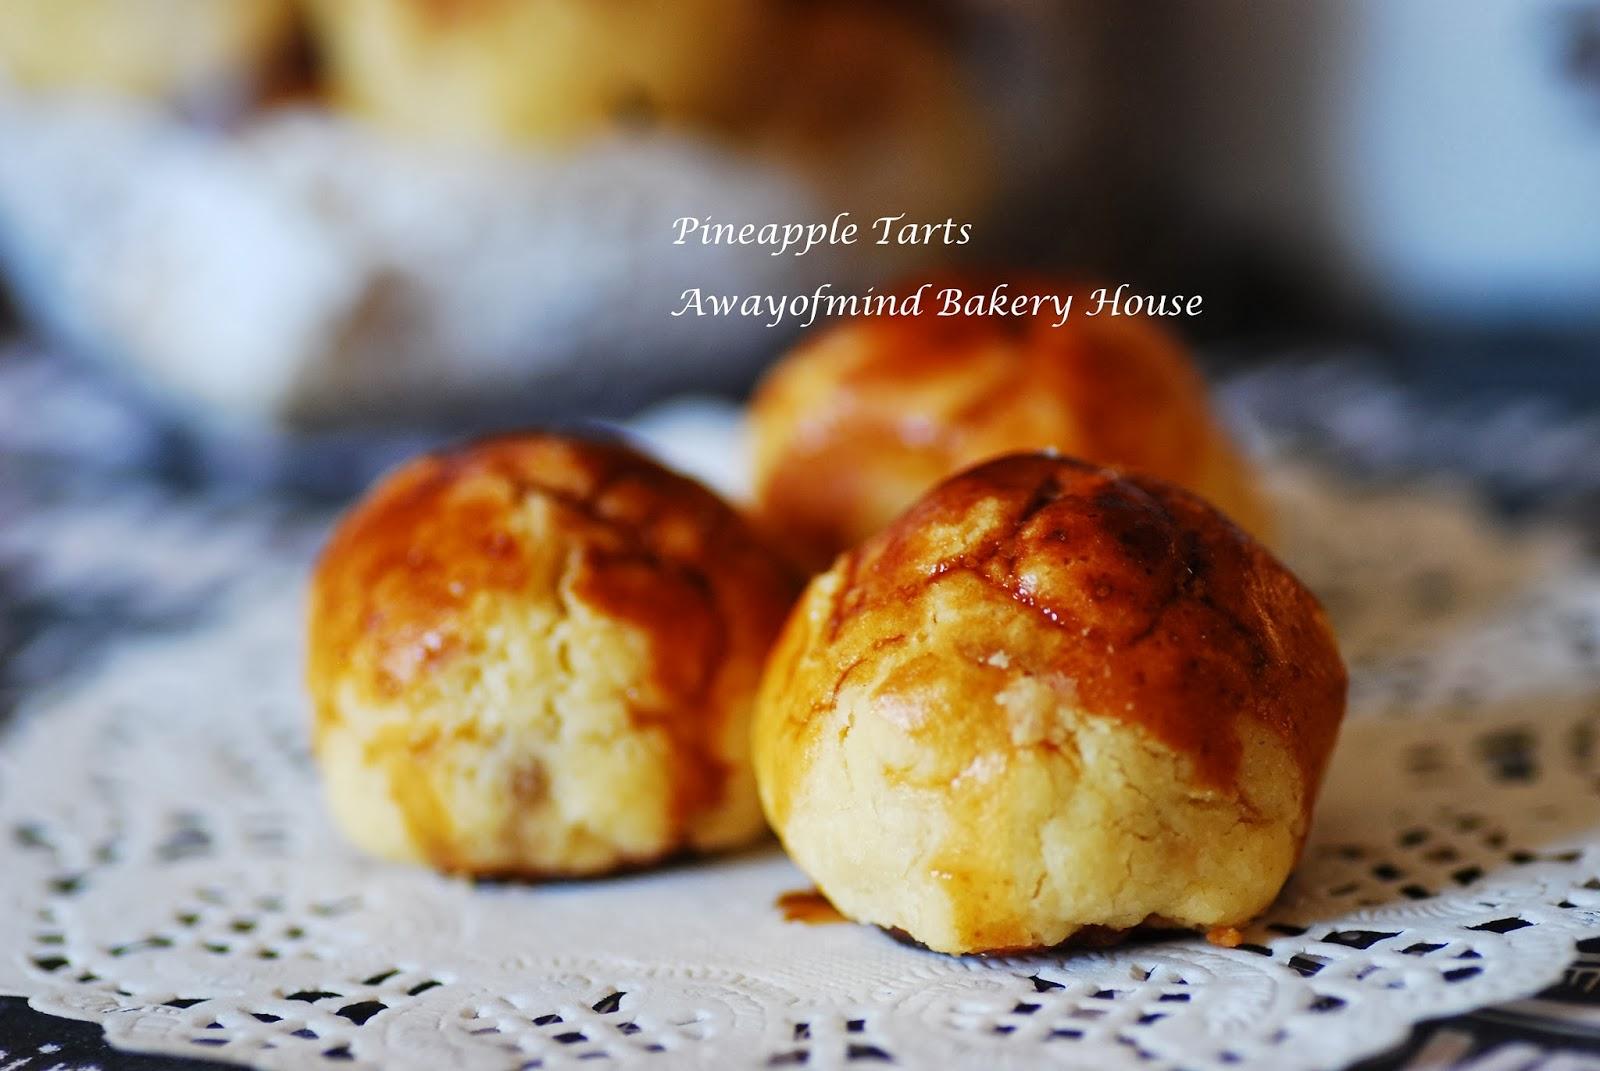 Awayofmind Bakery House: Homemade Pineapple Tarts and Jam 黄梨酥